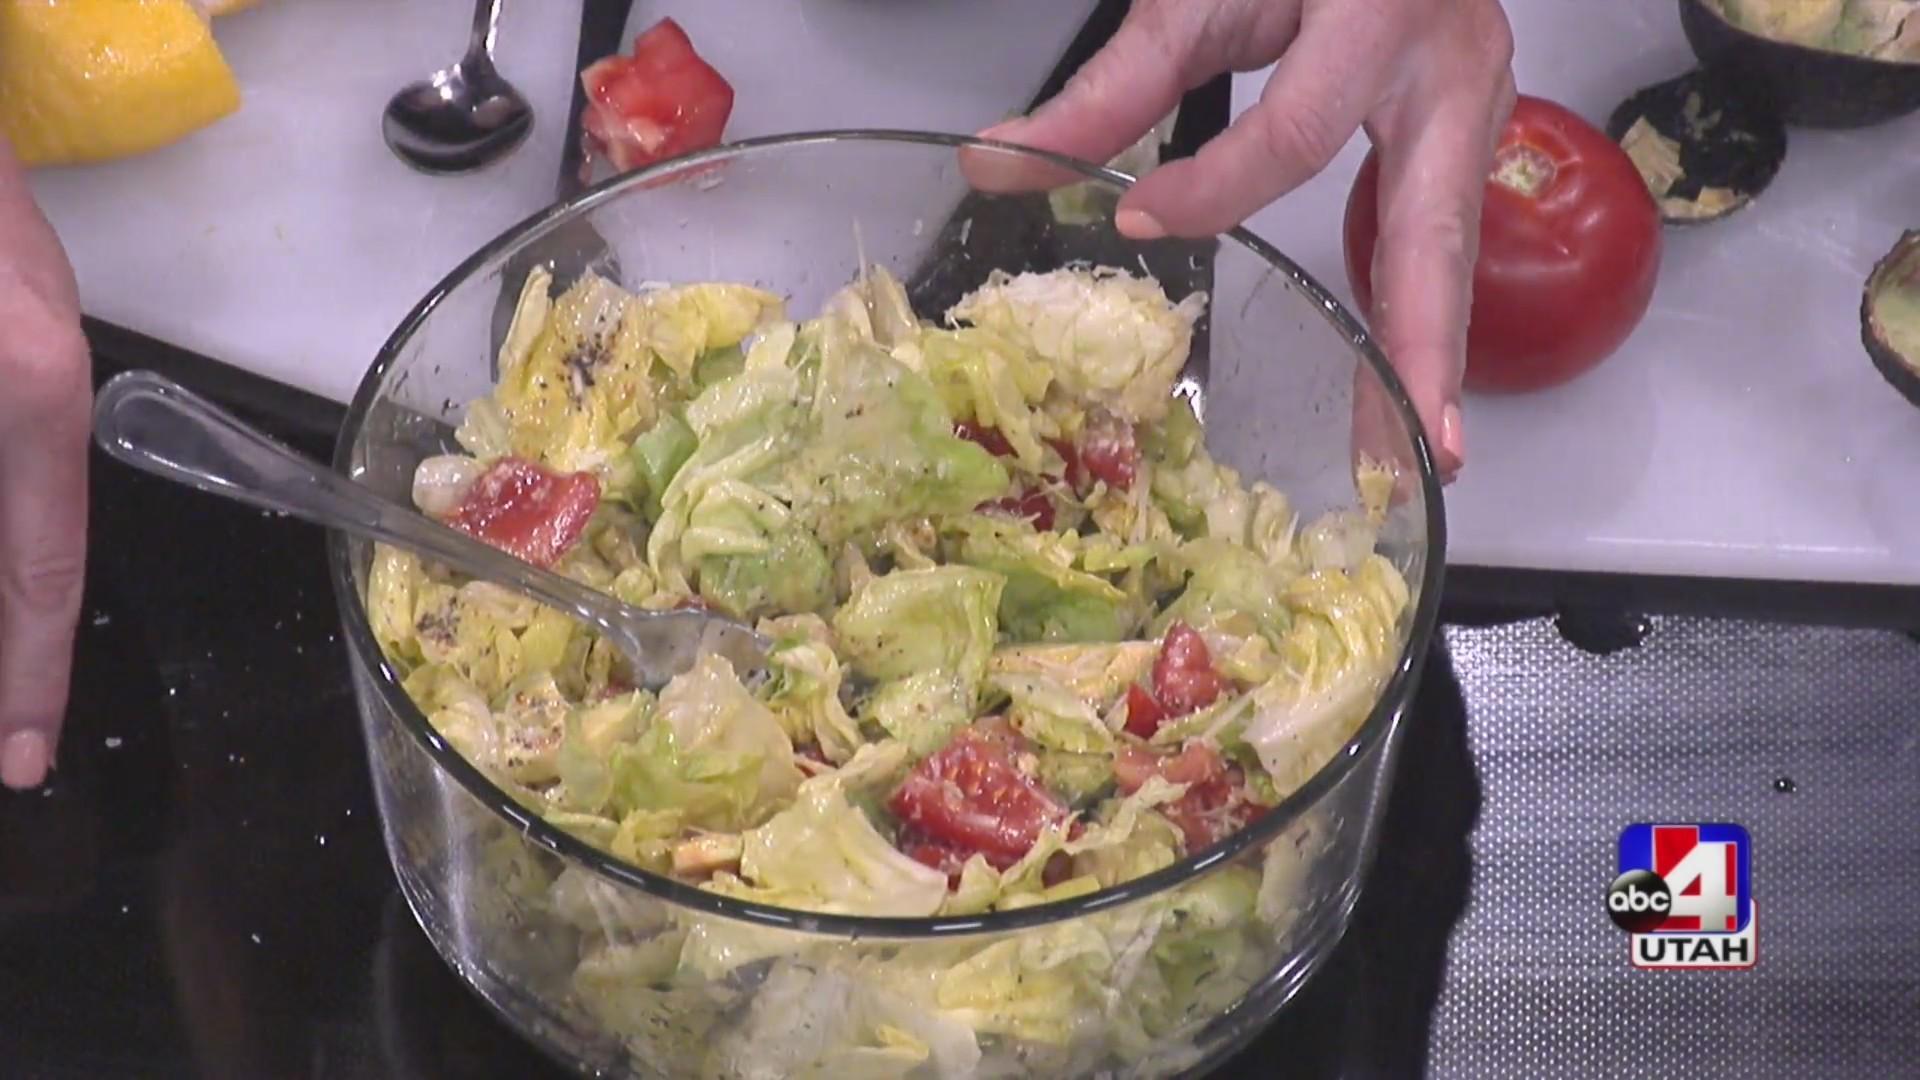 Reagan's favorite salad dressing